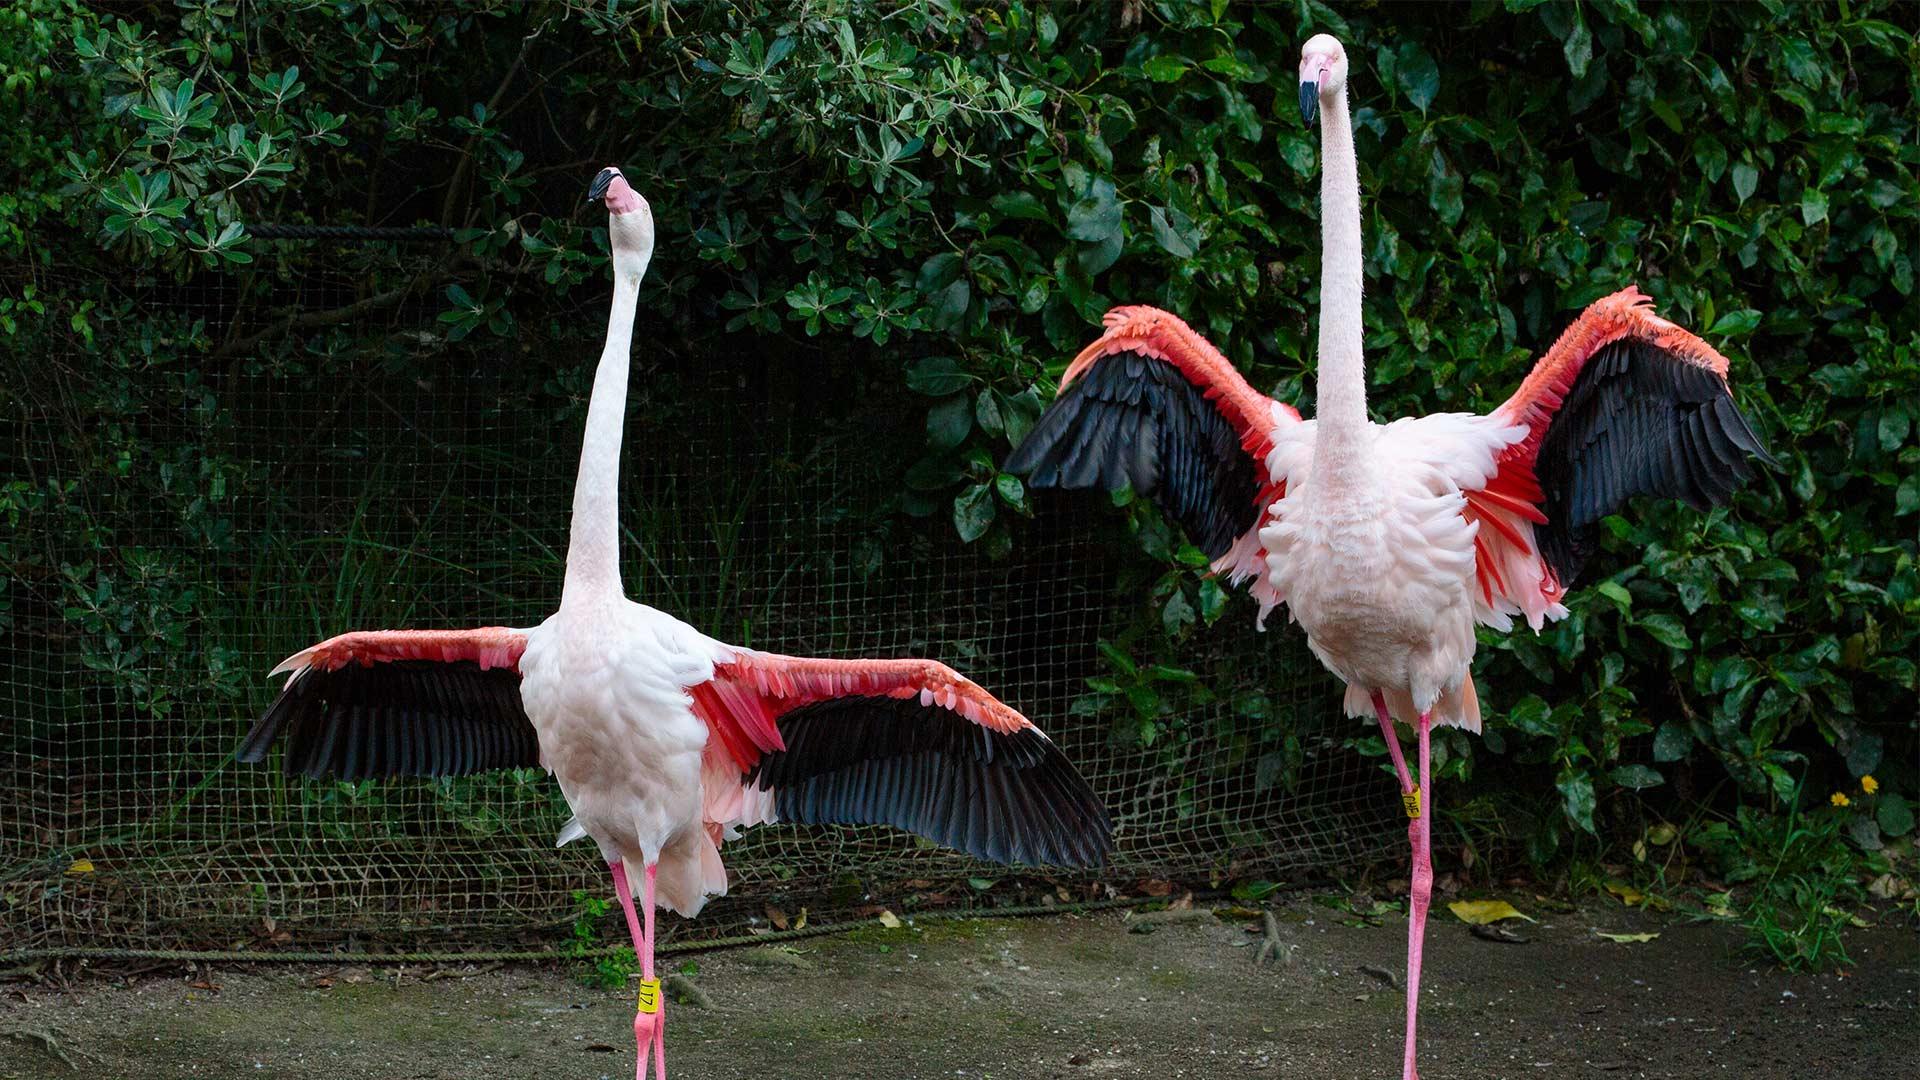 https://rfacdn.nz/zoo/assets/media/flamingo-dance-gallery.jpg